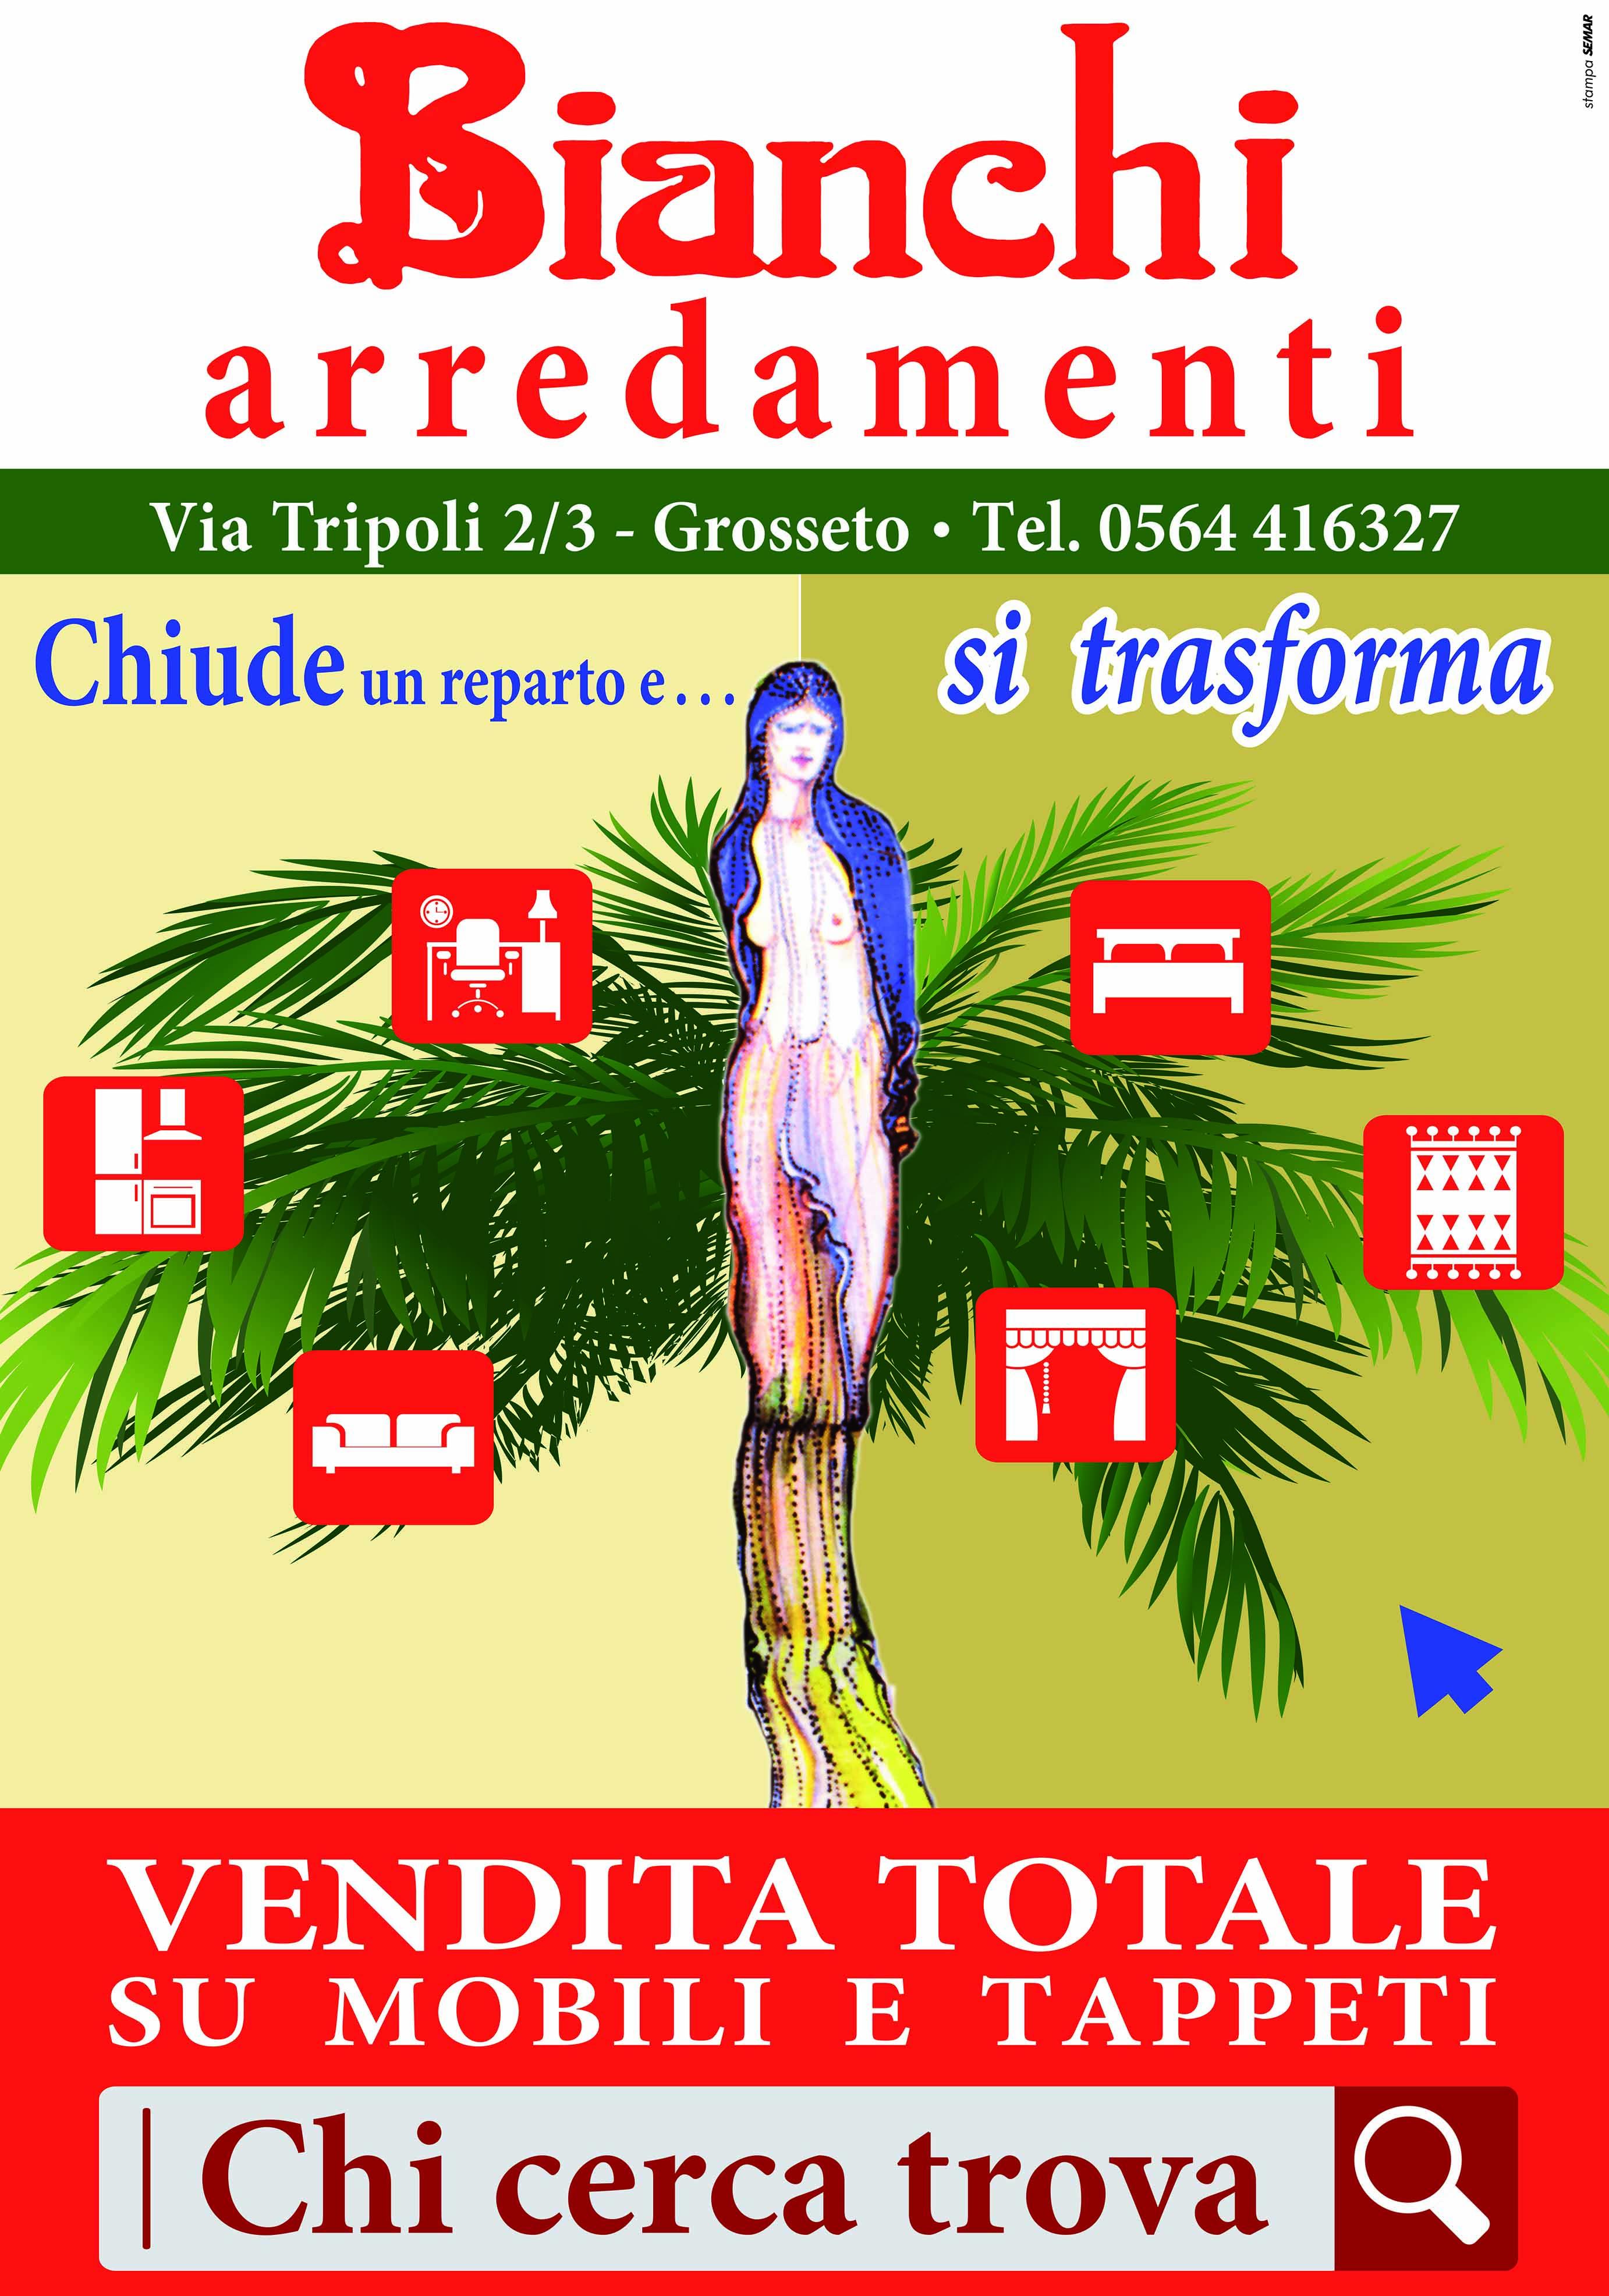 Bianchi arredamenti offerte speciali maremma toscana for Turco arredamenti offerte